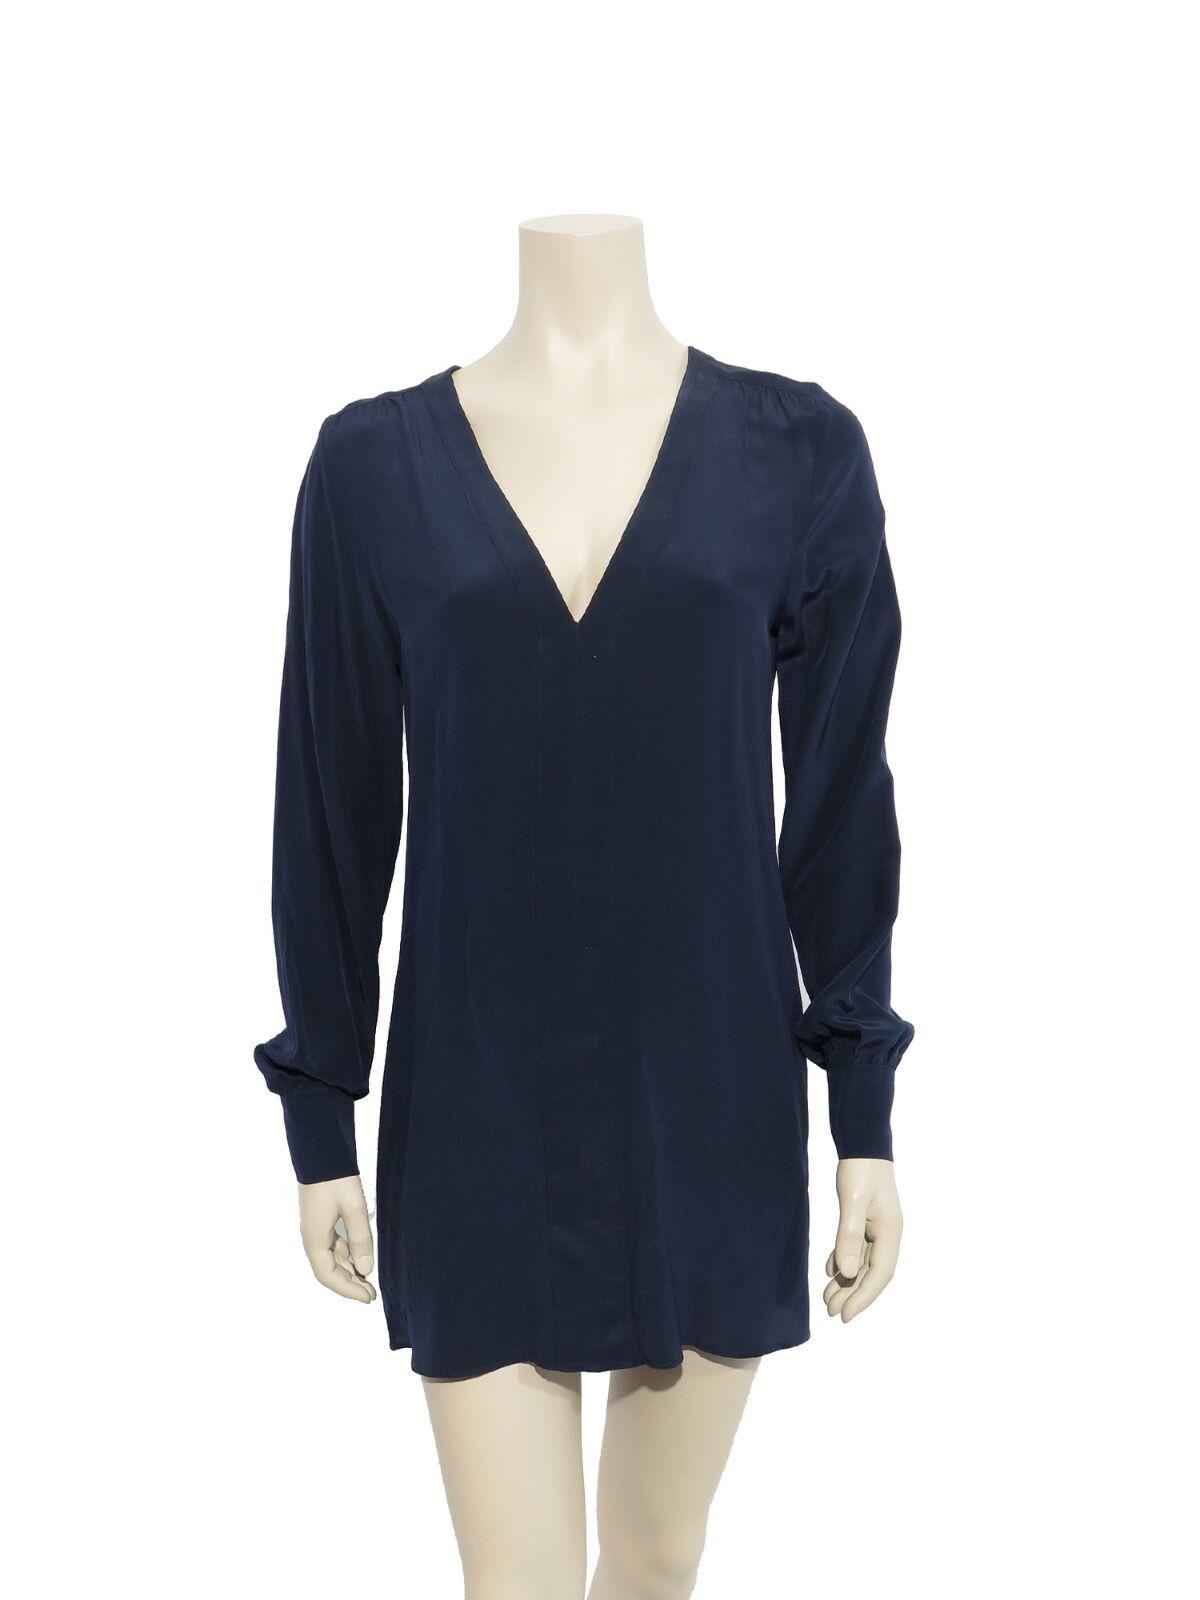 RORY BECA Silk Tunic Dress (Größe S)